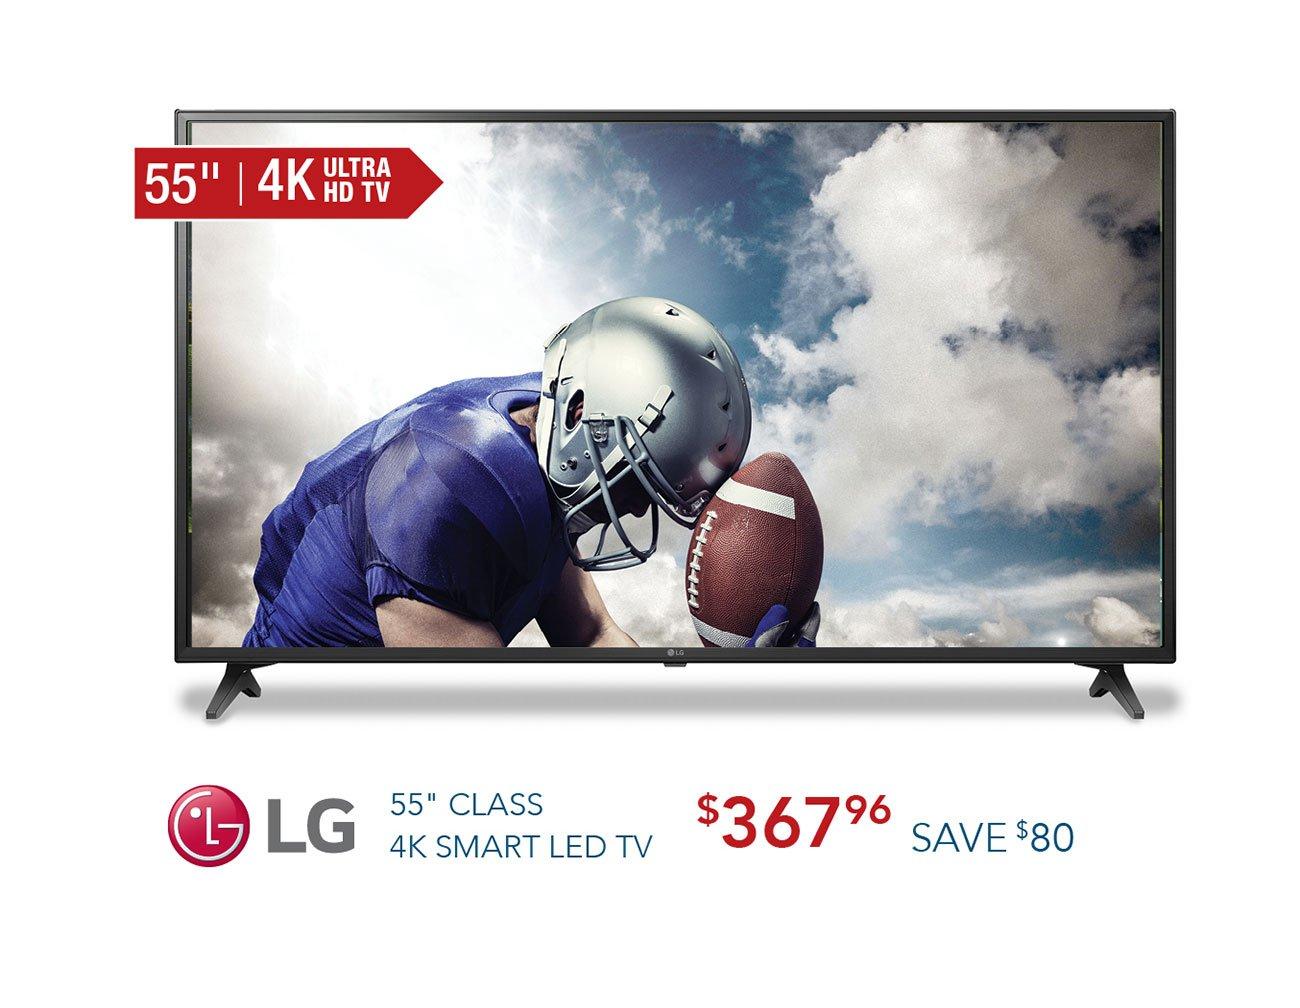 LG-55-inch-smart-TV